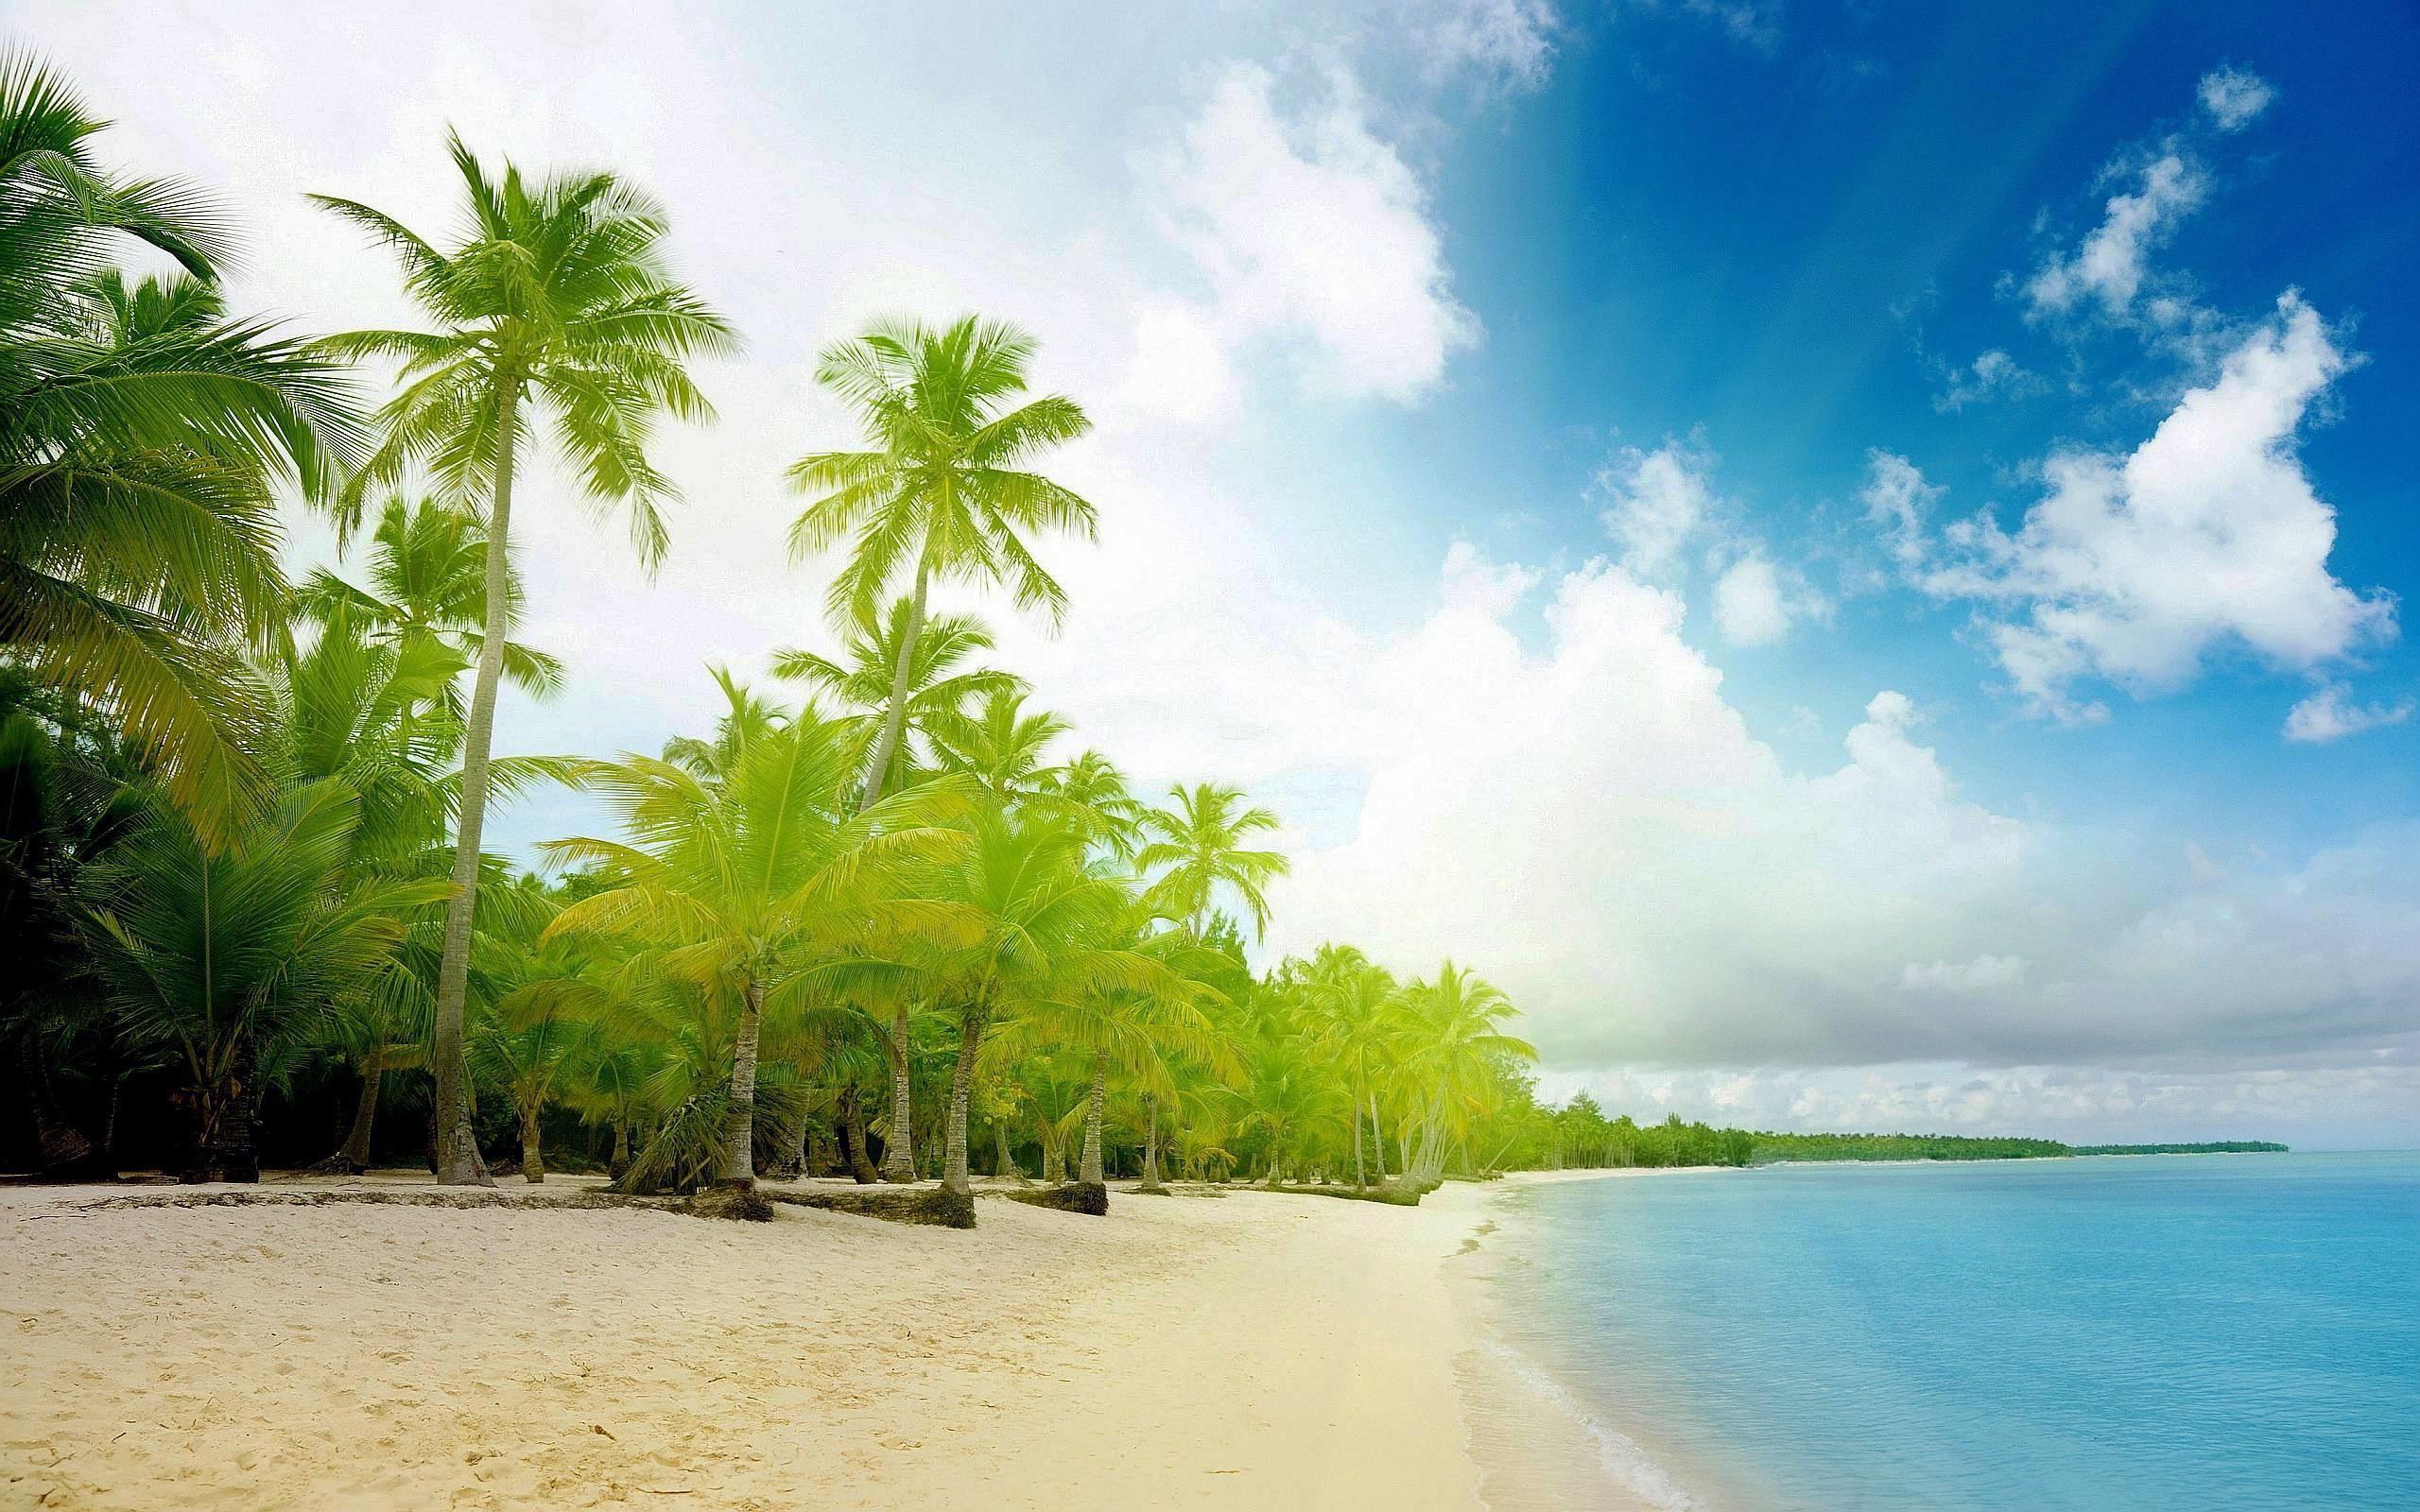 2560x1600 Exotic Beaches Wallpapers Hd 1080p 12 Aladdino